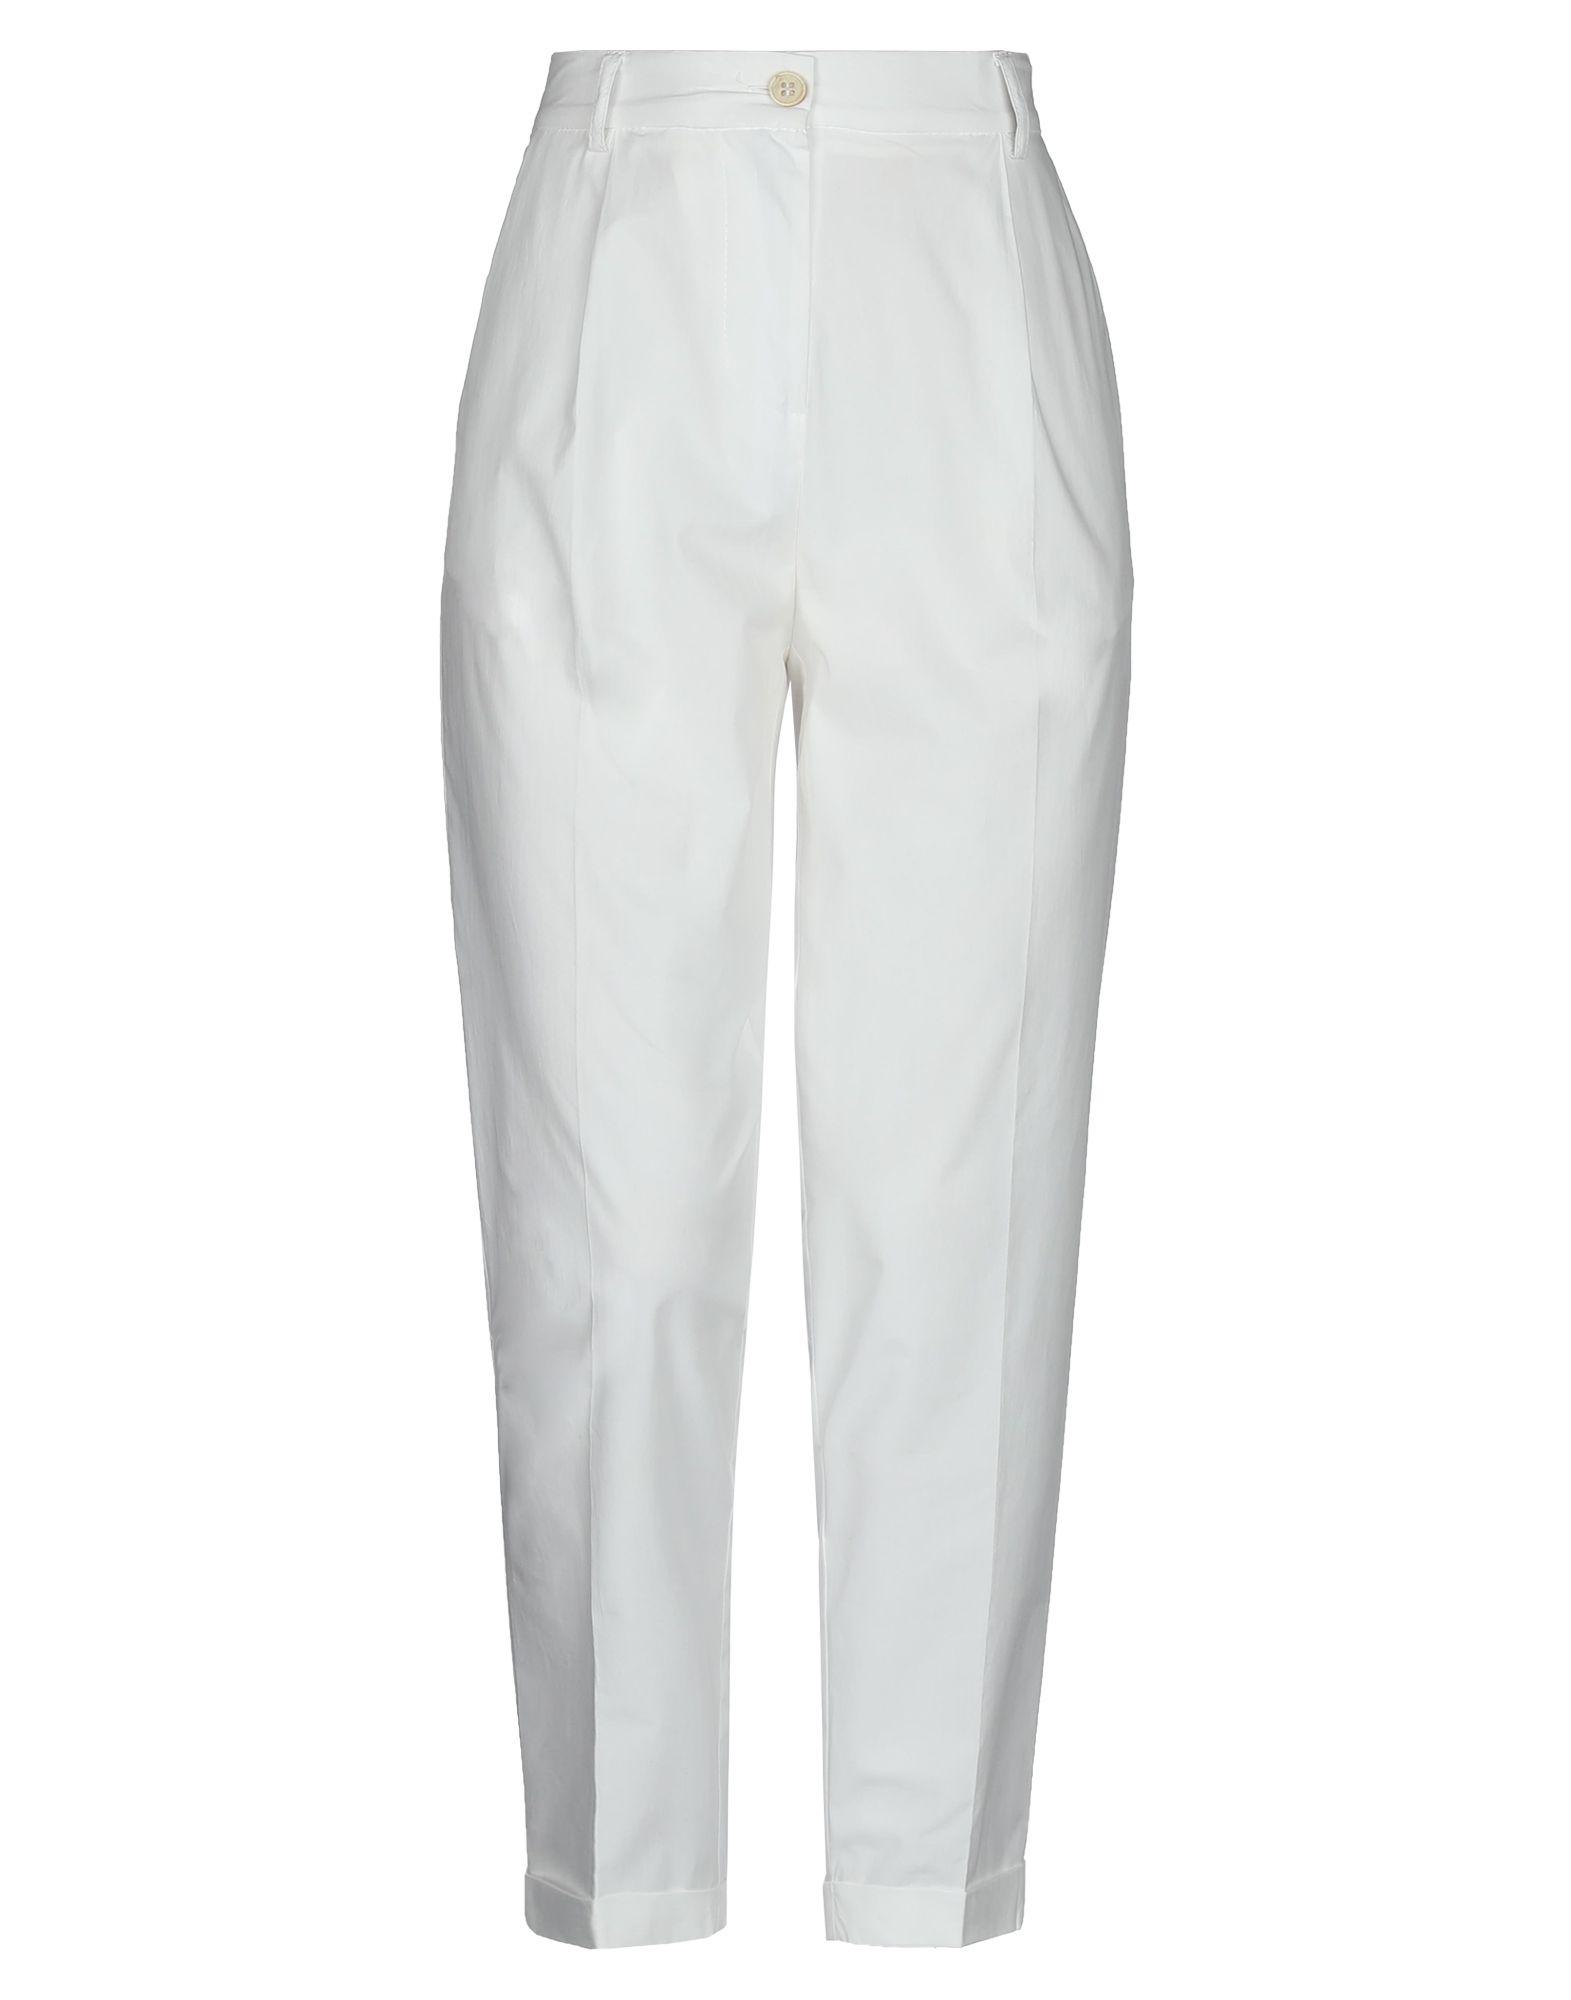 Фото - SOLOTRE Повседневные брюки solotre брюки капри